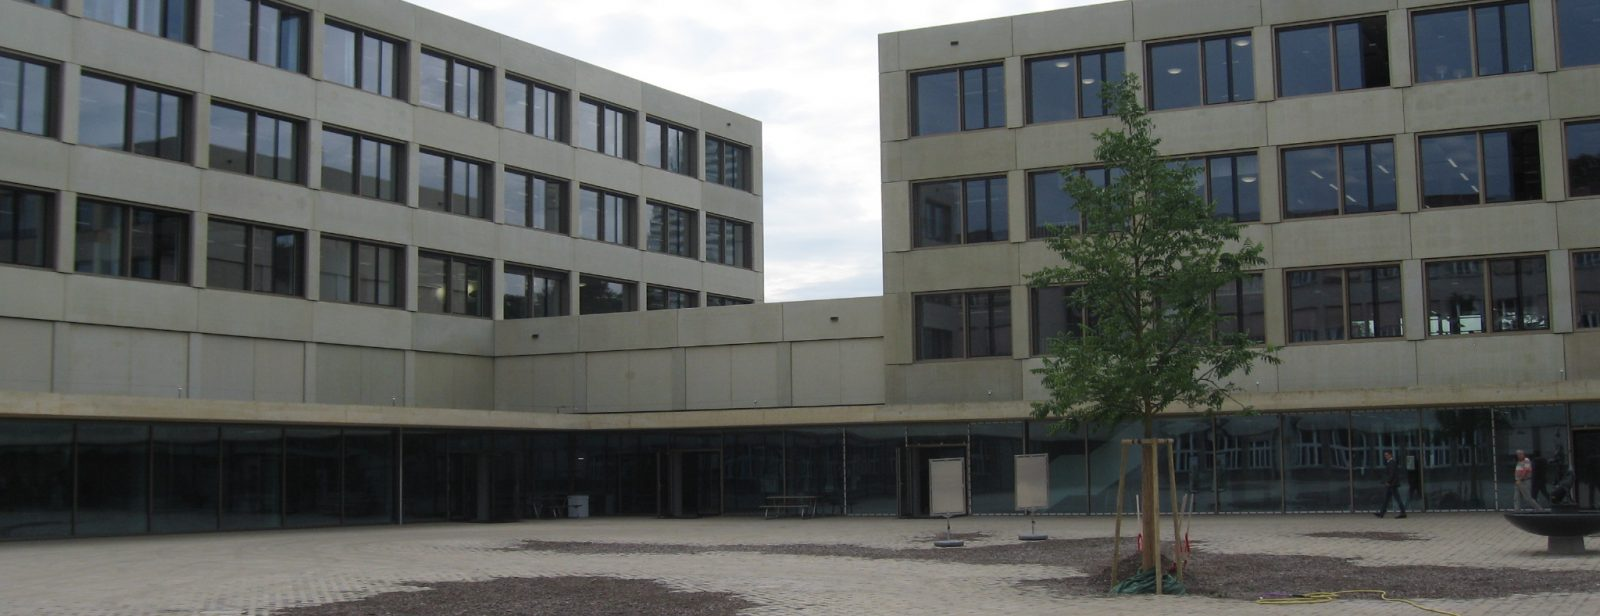 Neubau Schulhaus Sandgruben, Basel